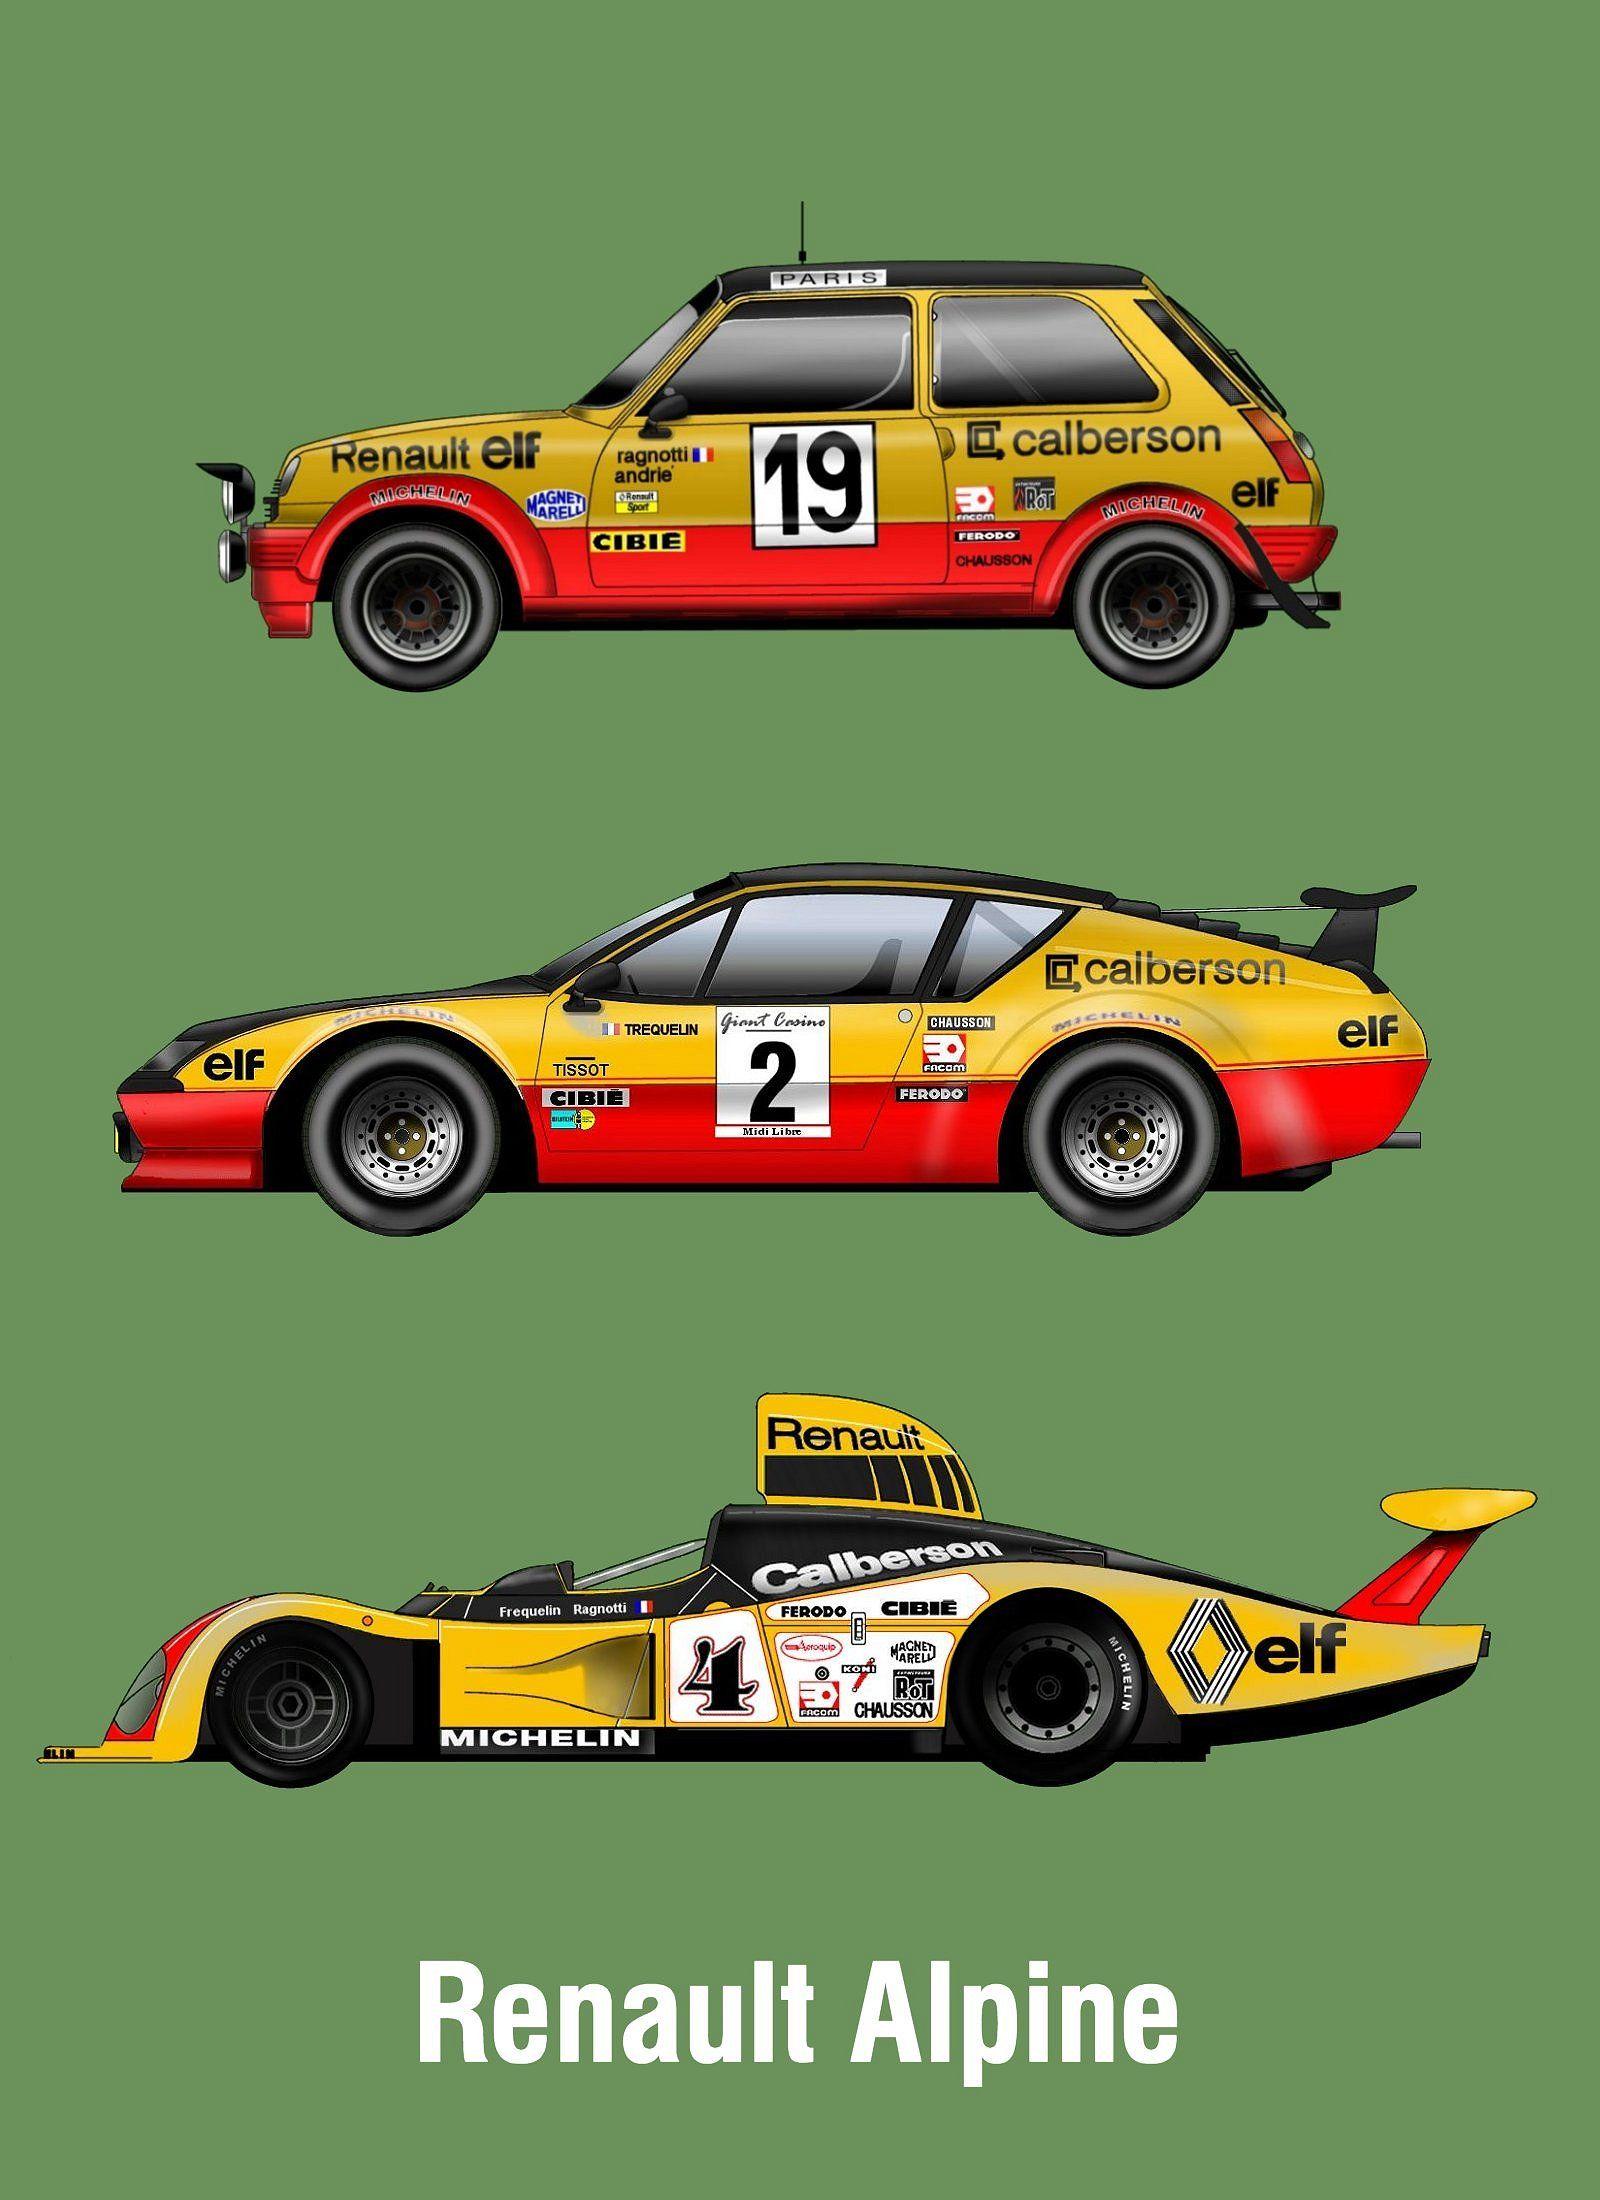 Renault-Alpine | RACING CARS IN PROFILE | Pinterest | Cars, Car ...